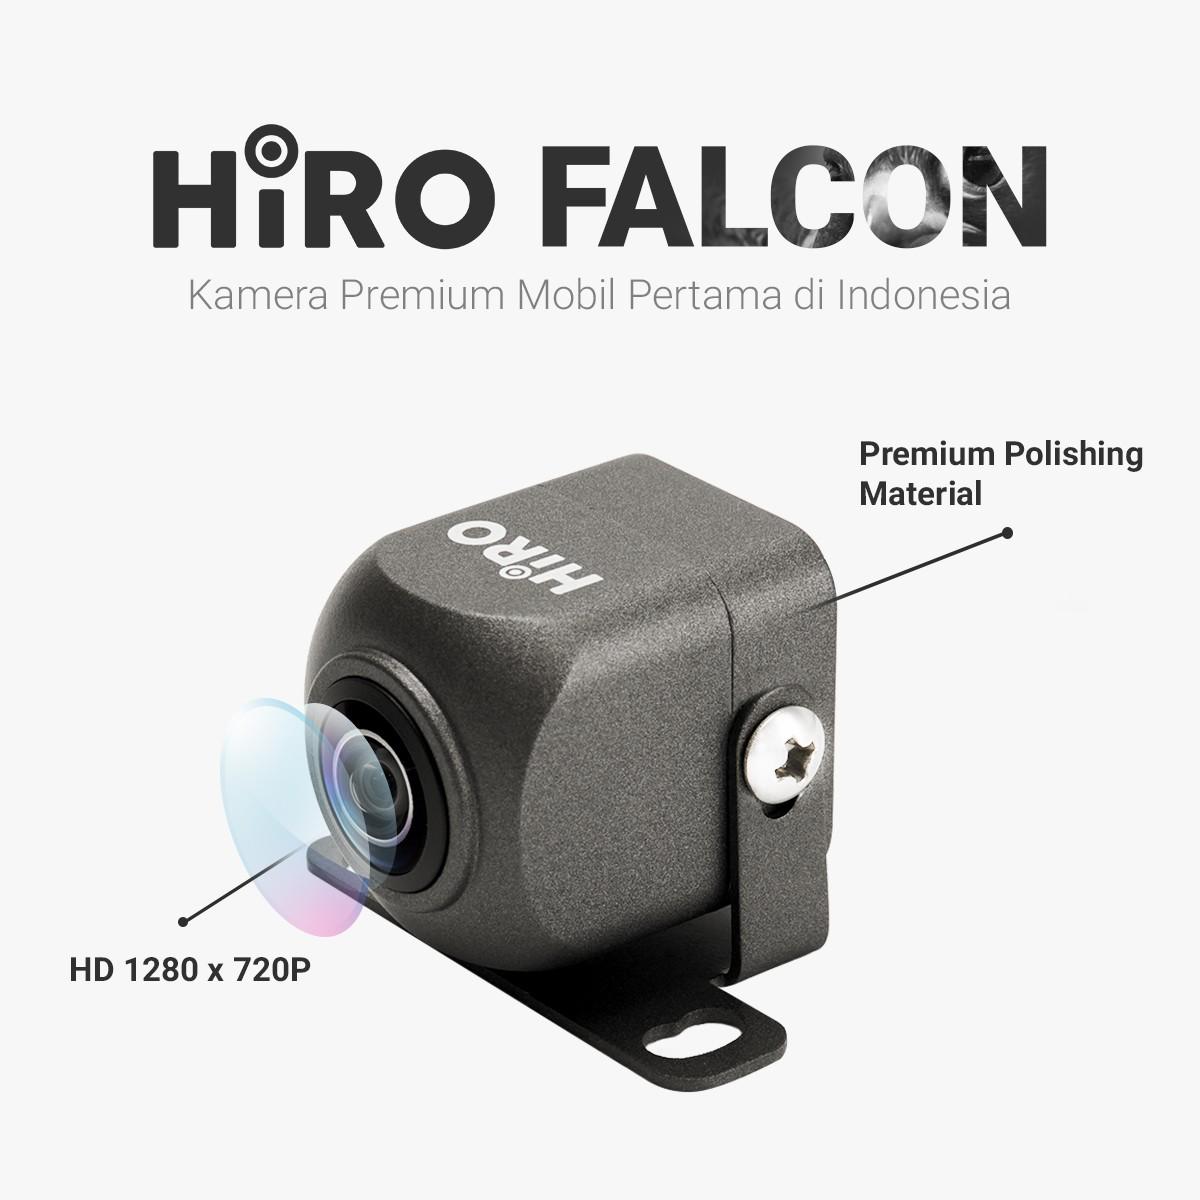 HIRO FALCON - KAMERA MUNDUR PREMIUM HD 1280P